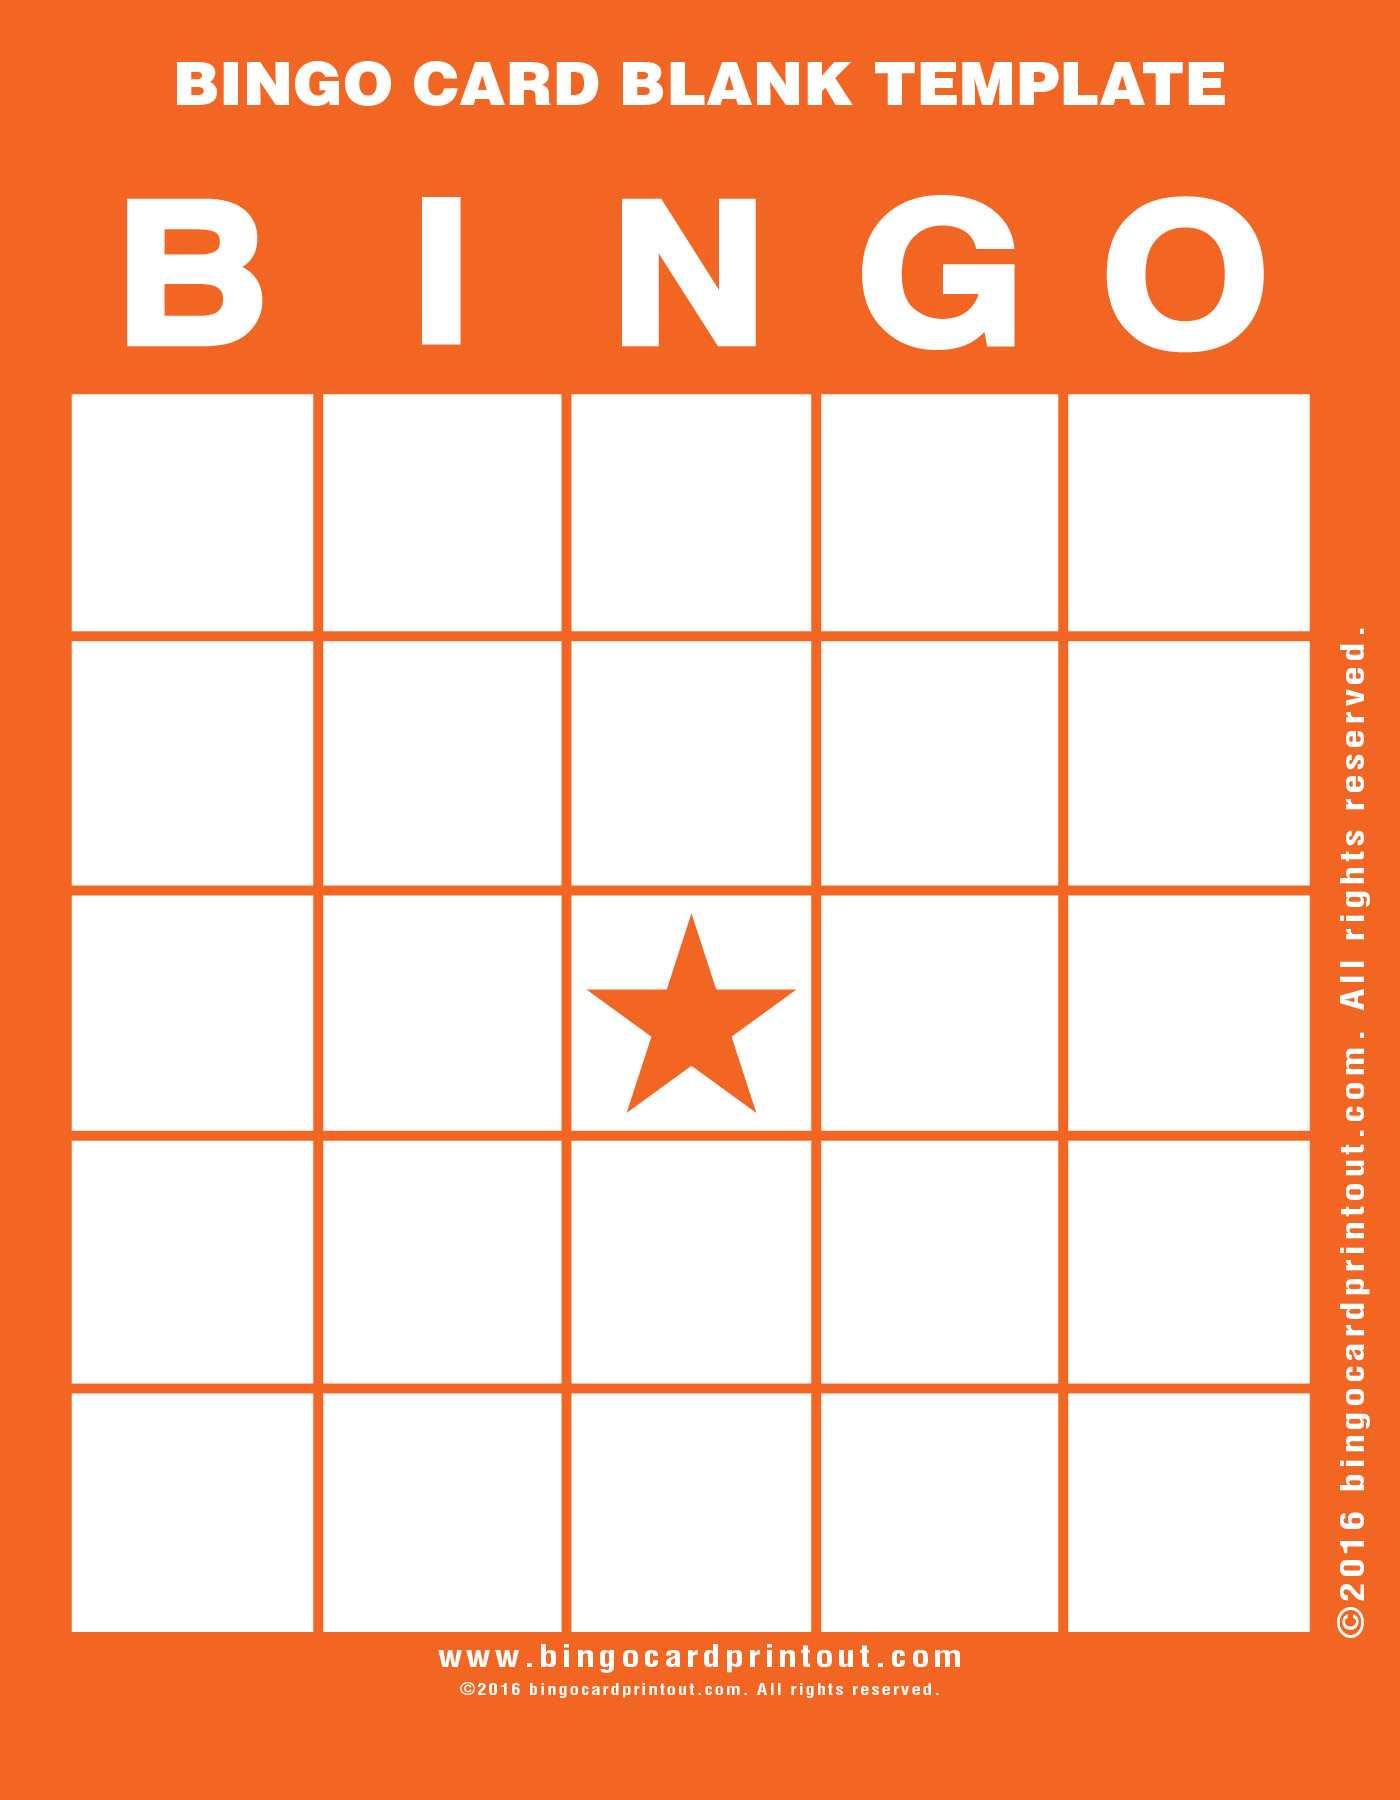 009 Bingo Card Blank Template Stirring Ideas Cards Print Within Blank Bingo Card Template Microsoft Word